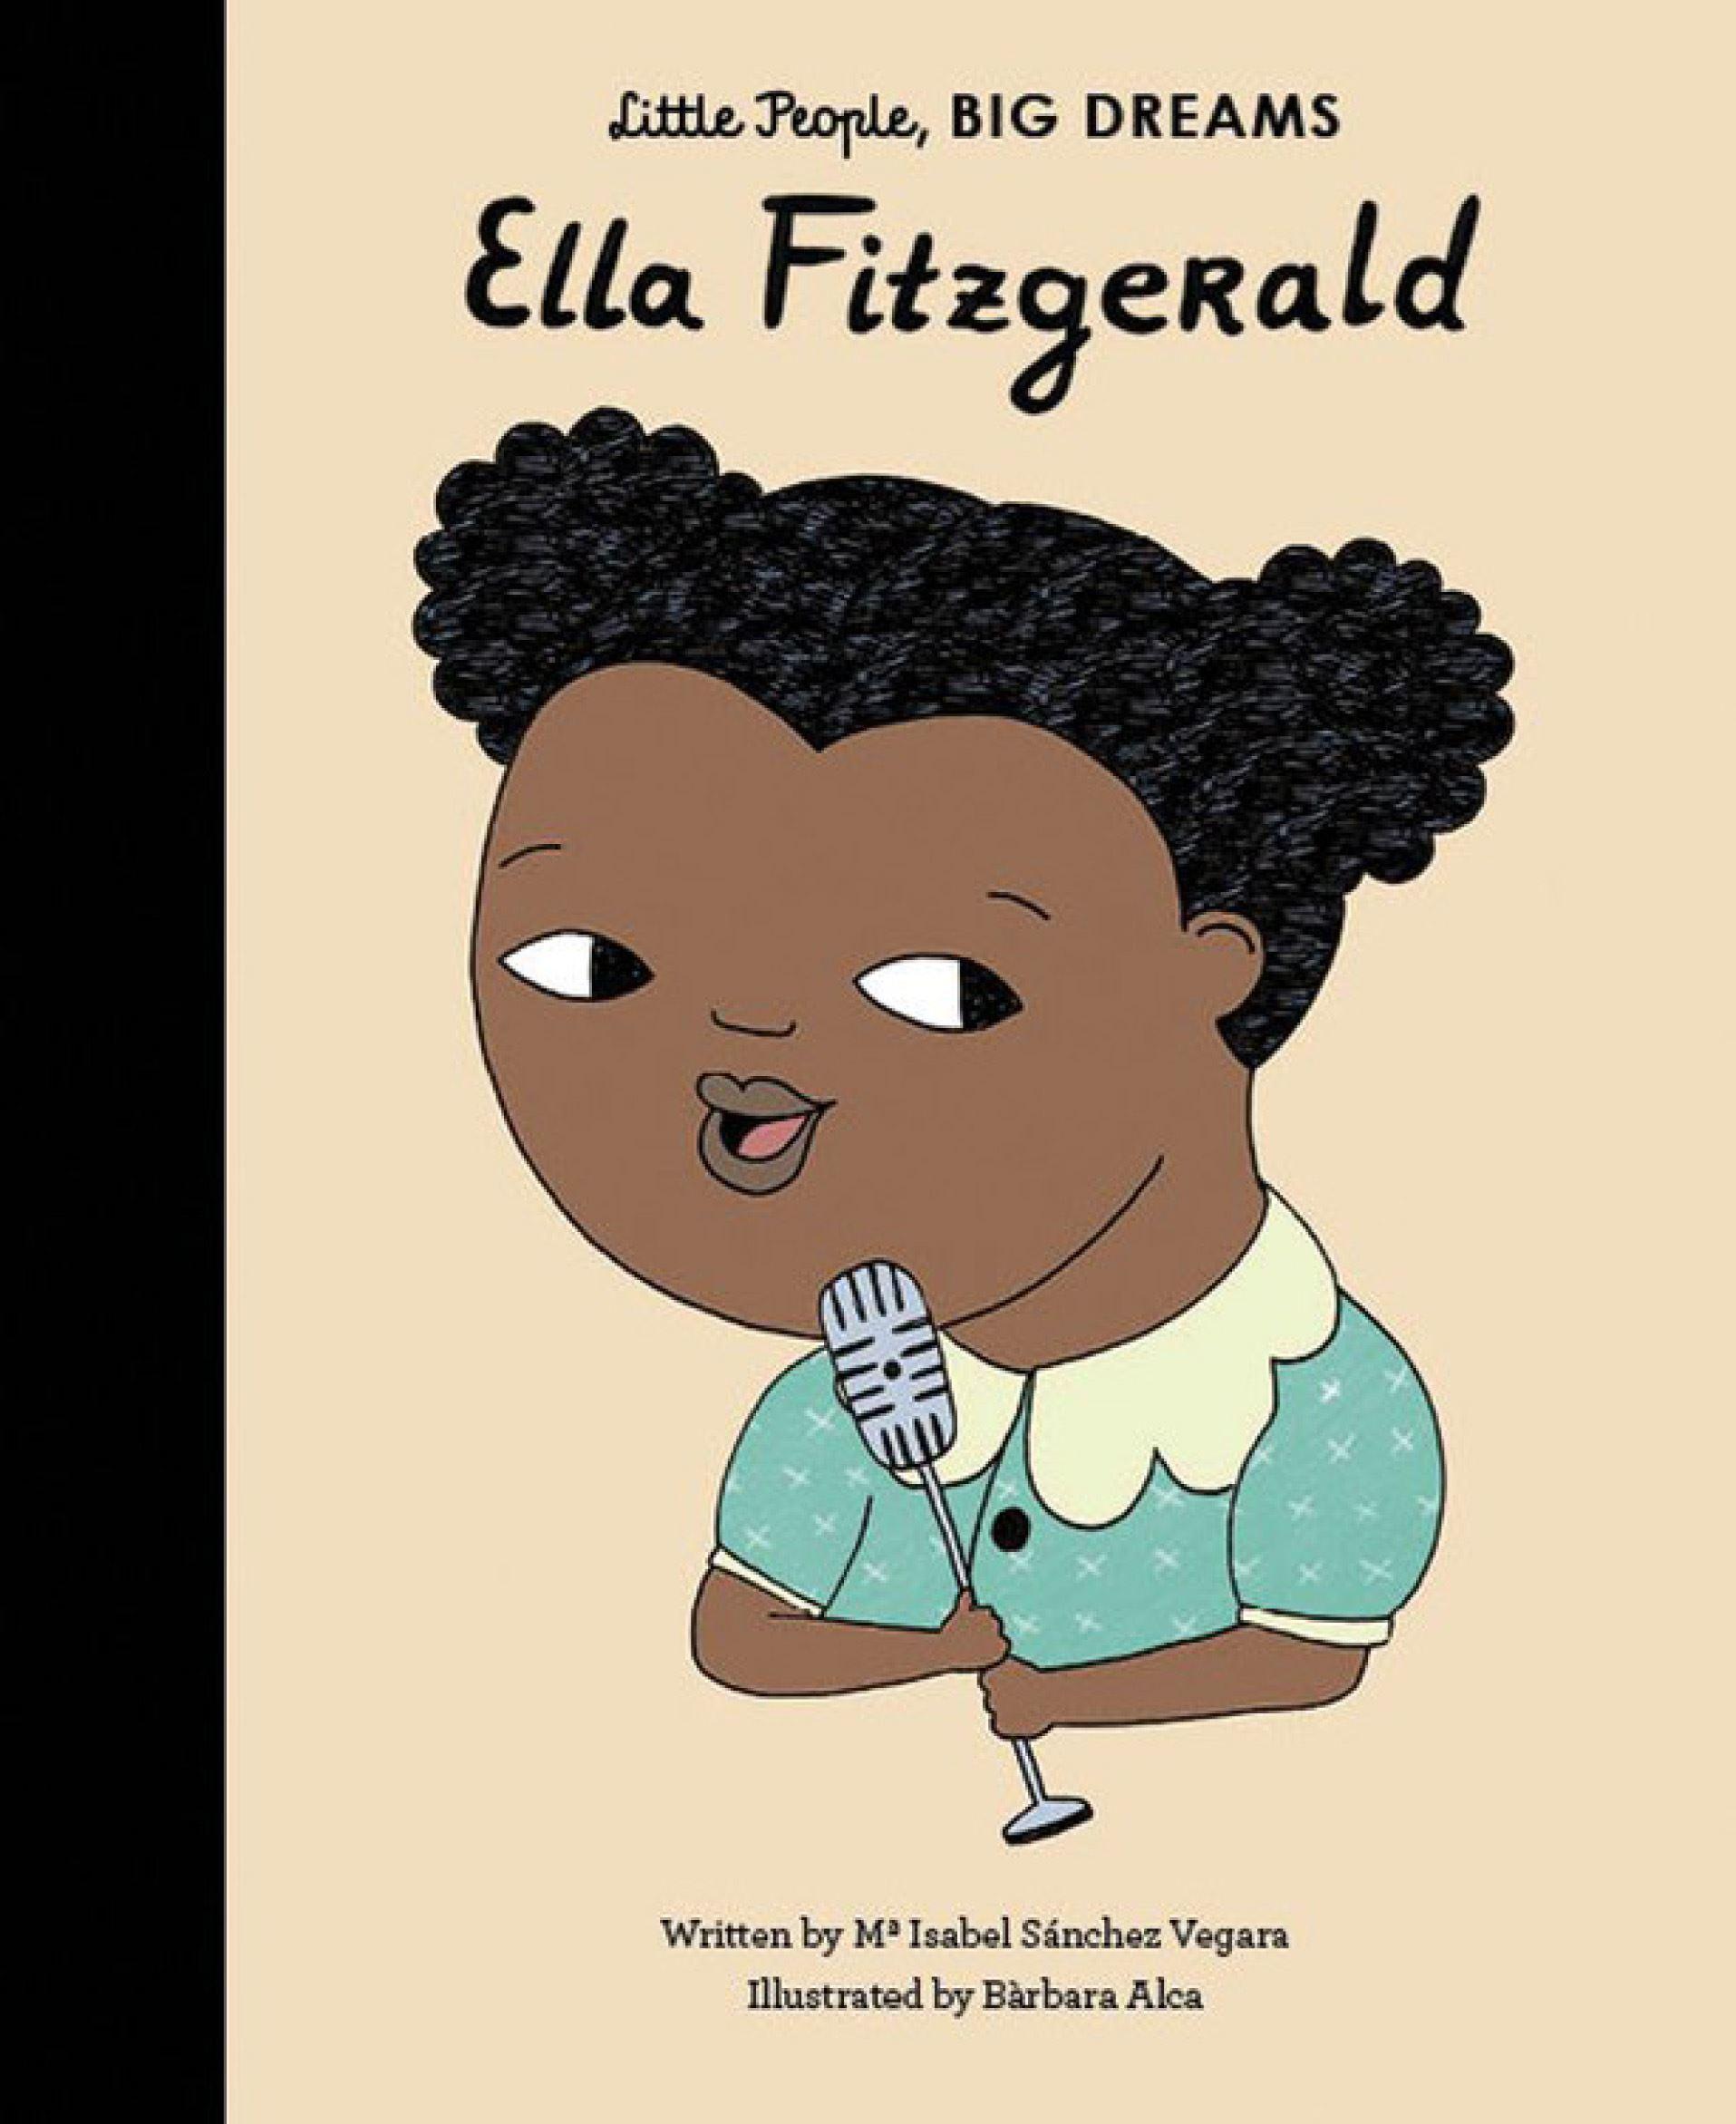 Little People Big Dreams: Ella Fitzgerald